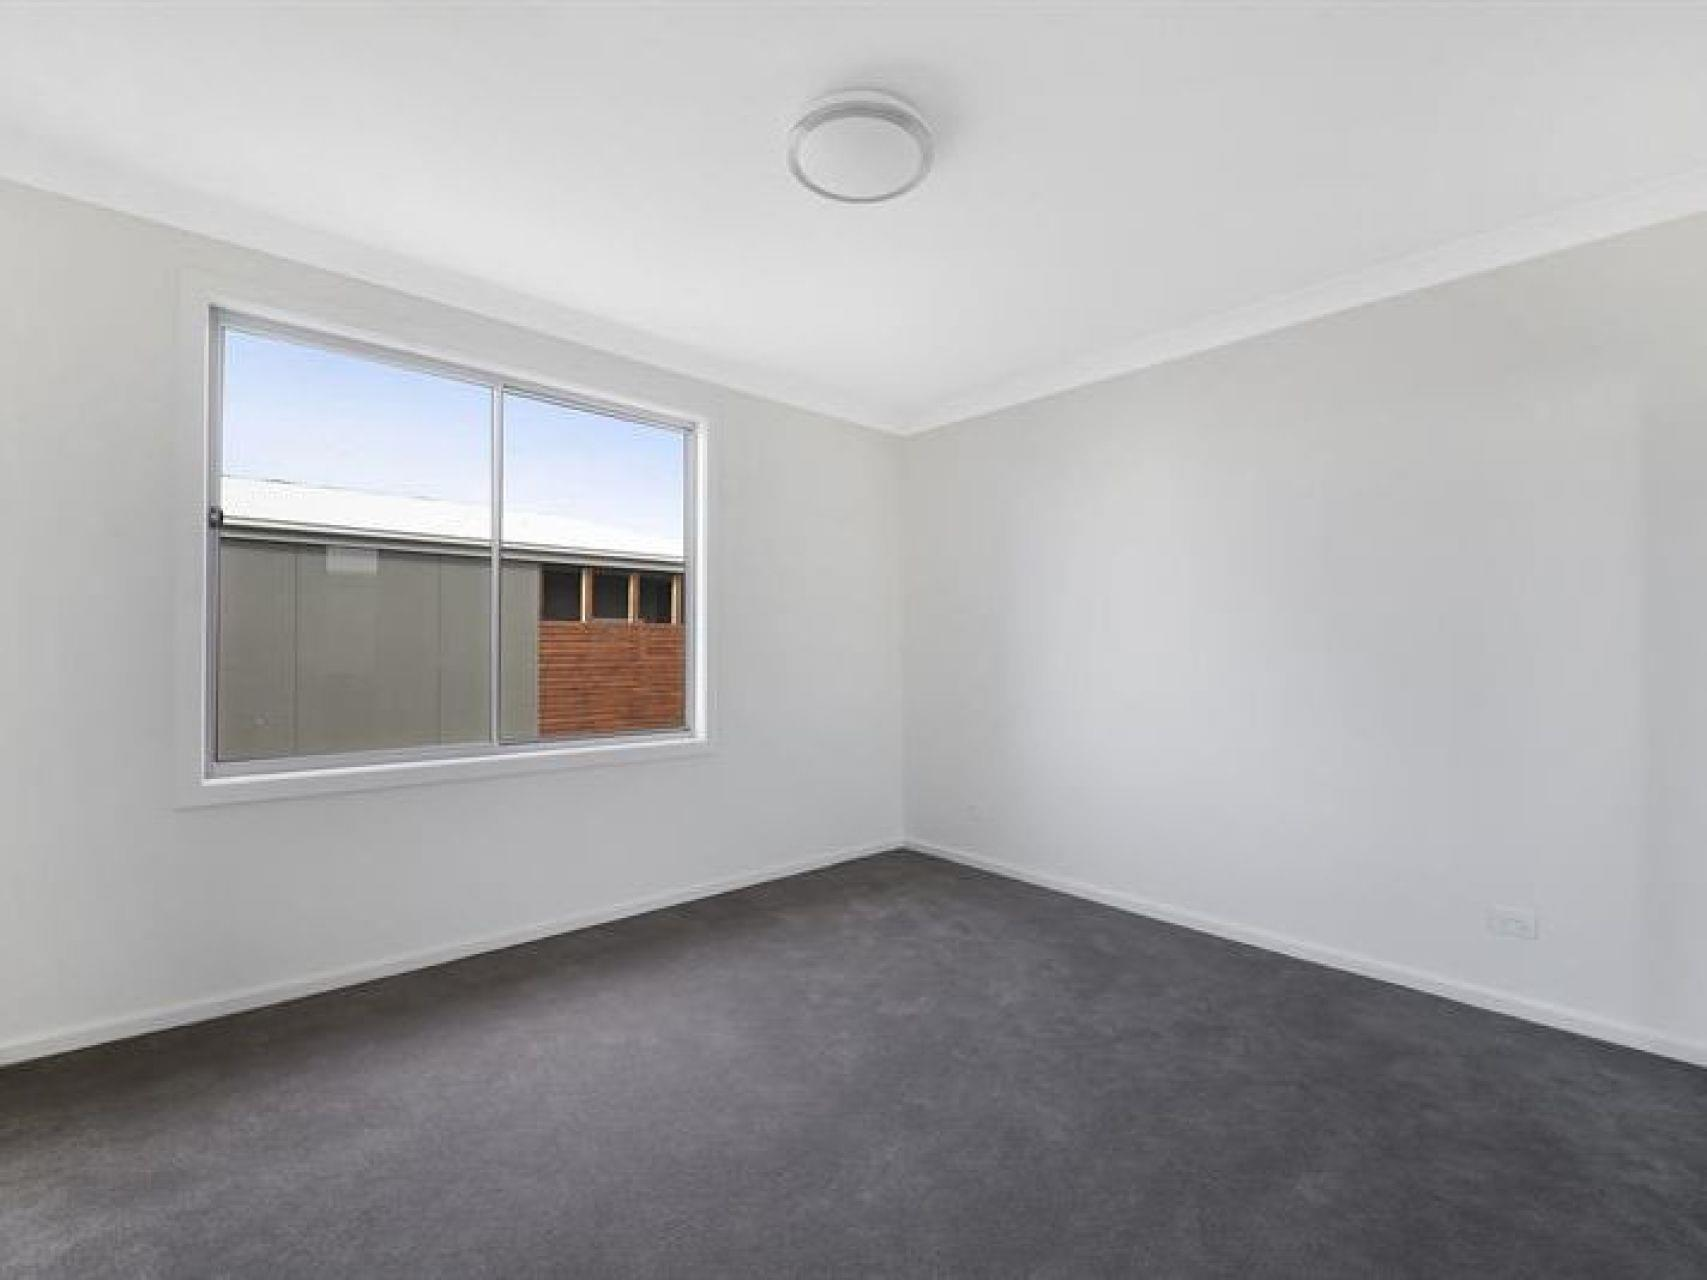 30 Coldstream Lane, Gledswood Hills, NSW 2557